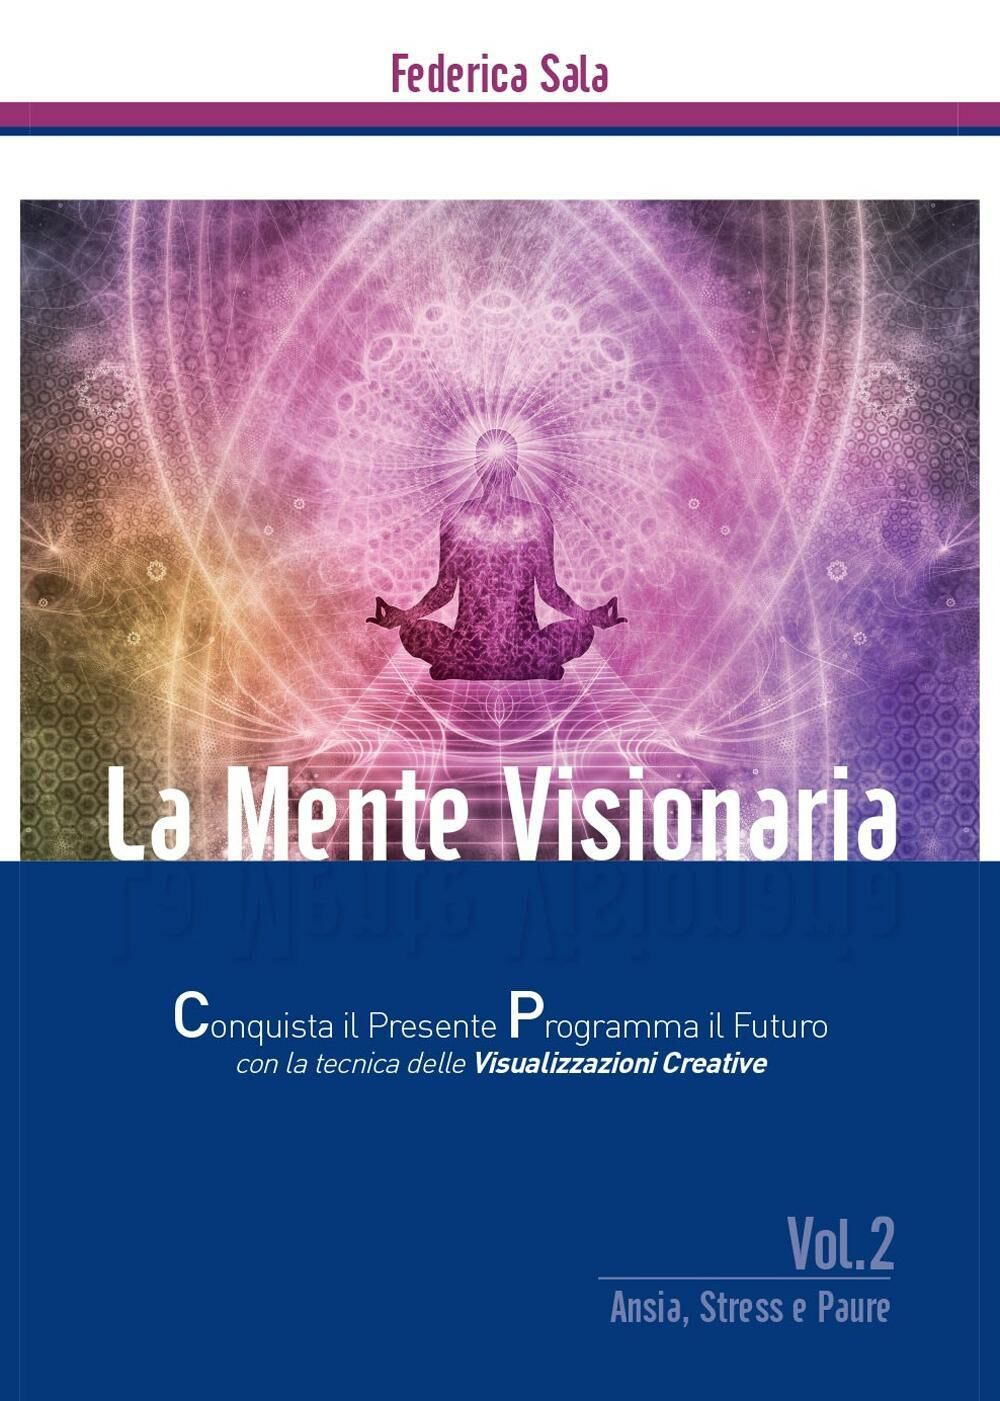 La mente visionaria. Ansia, stress & paure. Vol. 2